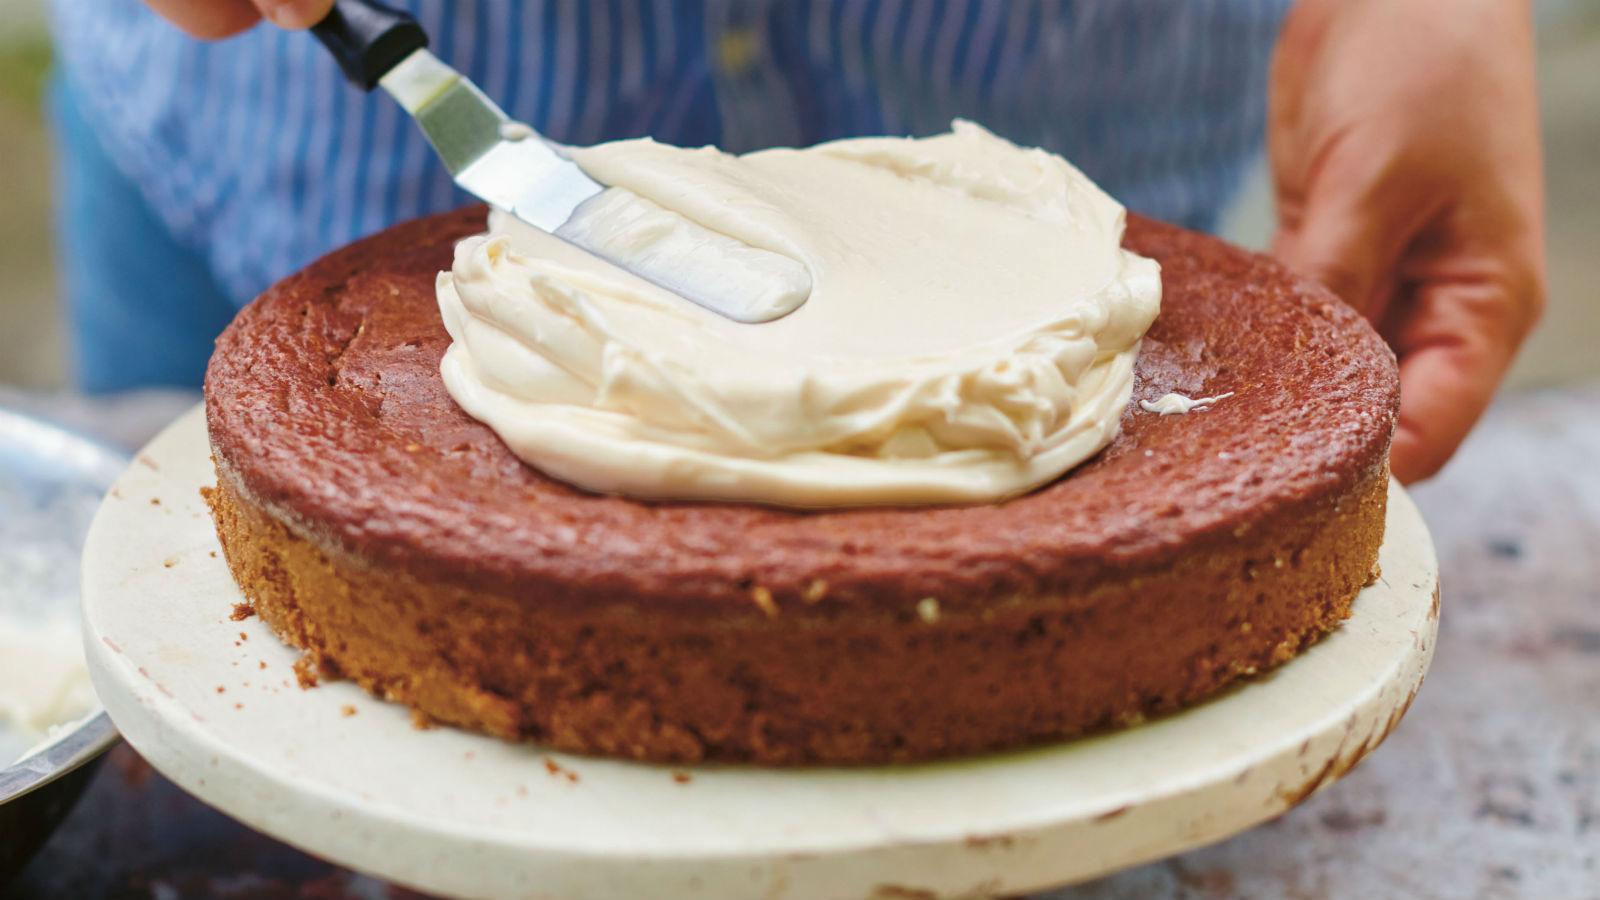 Applesauce Cake with Cream Cheese & Honey Frosting Recipe | The Nosher